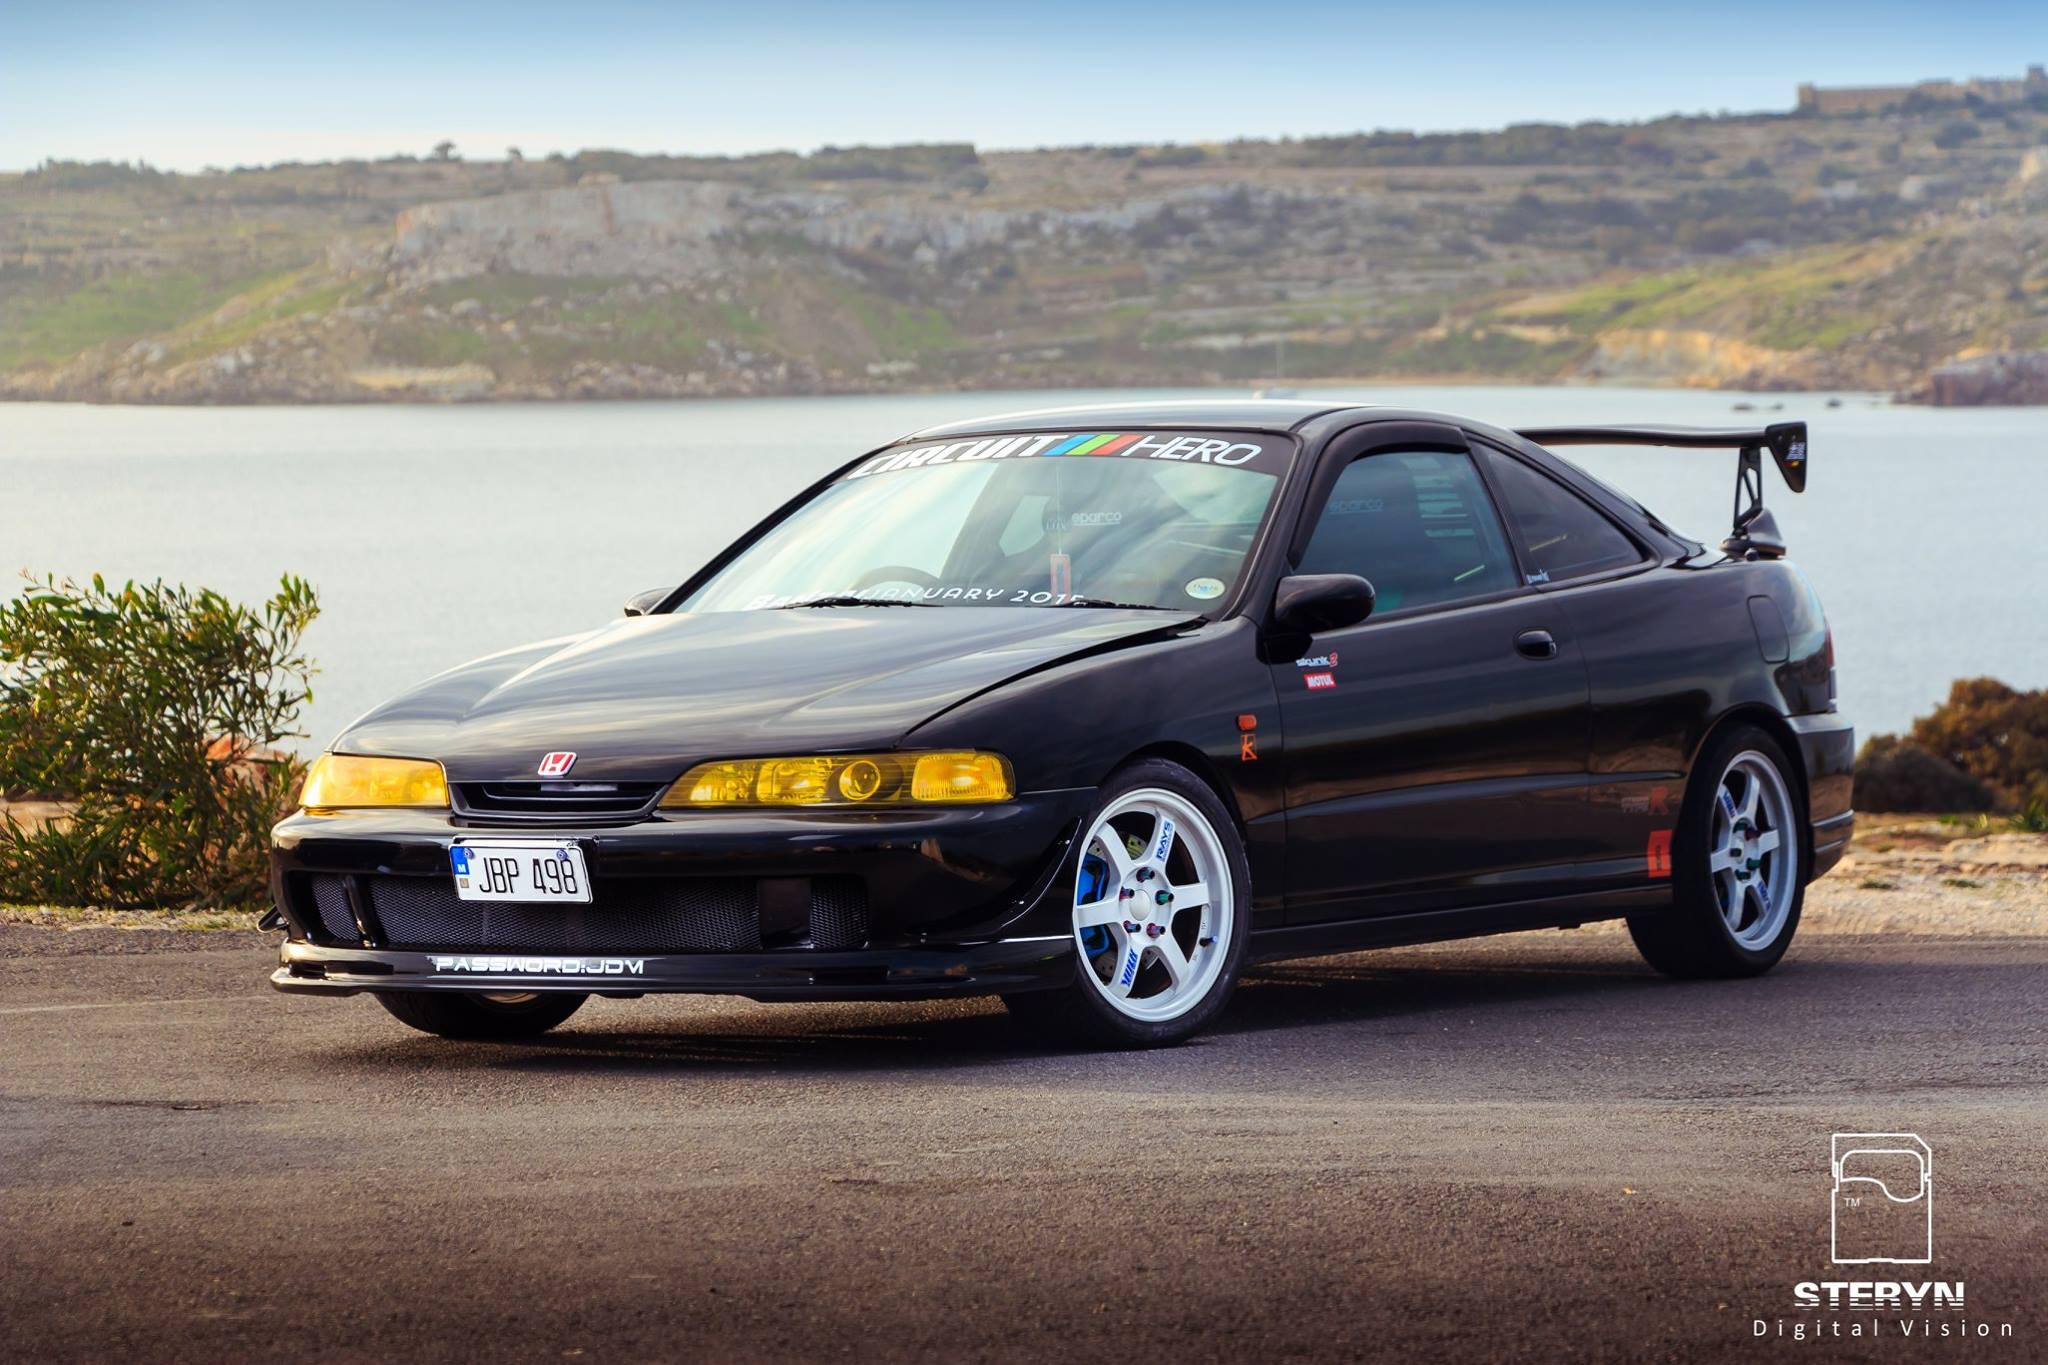 Starlight Black Pearl 1998 JDM Honda Integra Type-r in front of scenic water